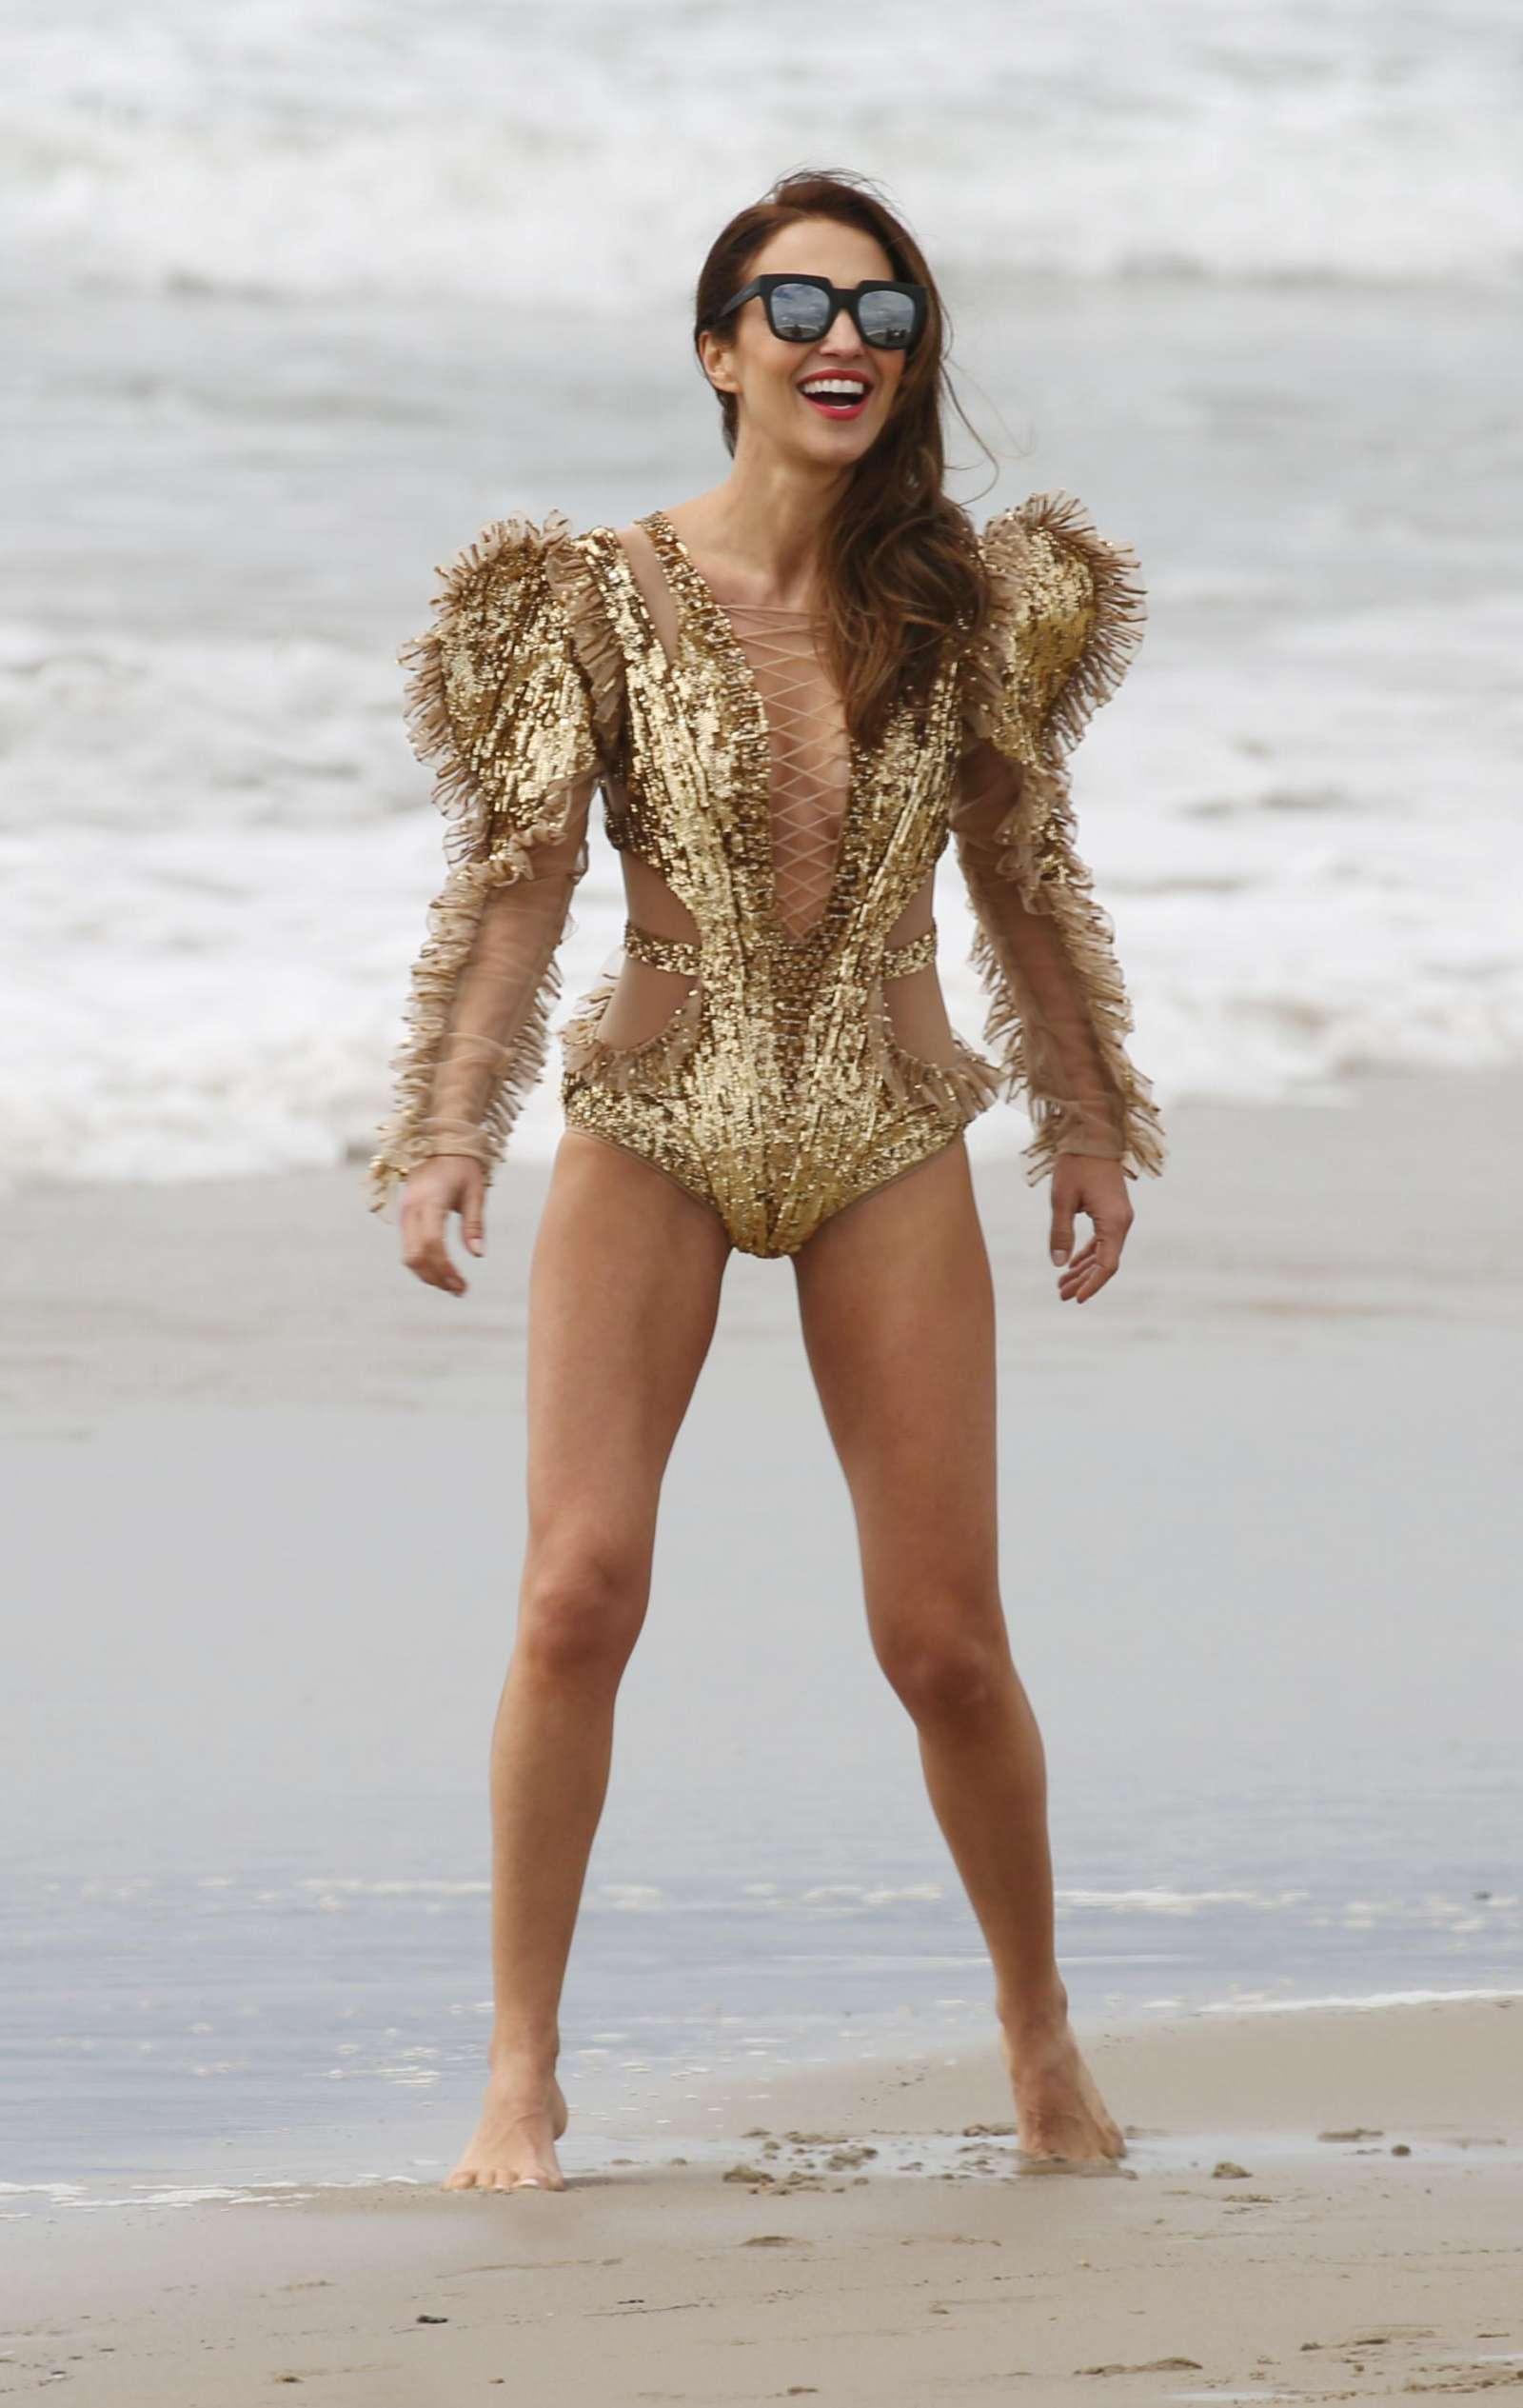 Cleavage Paula Echevarria nudes (47 photo), Sexy, Is a cute, Feet, cleavage 2015